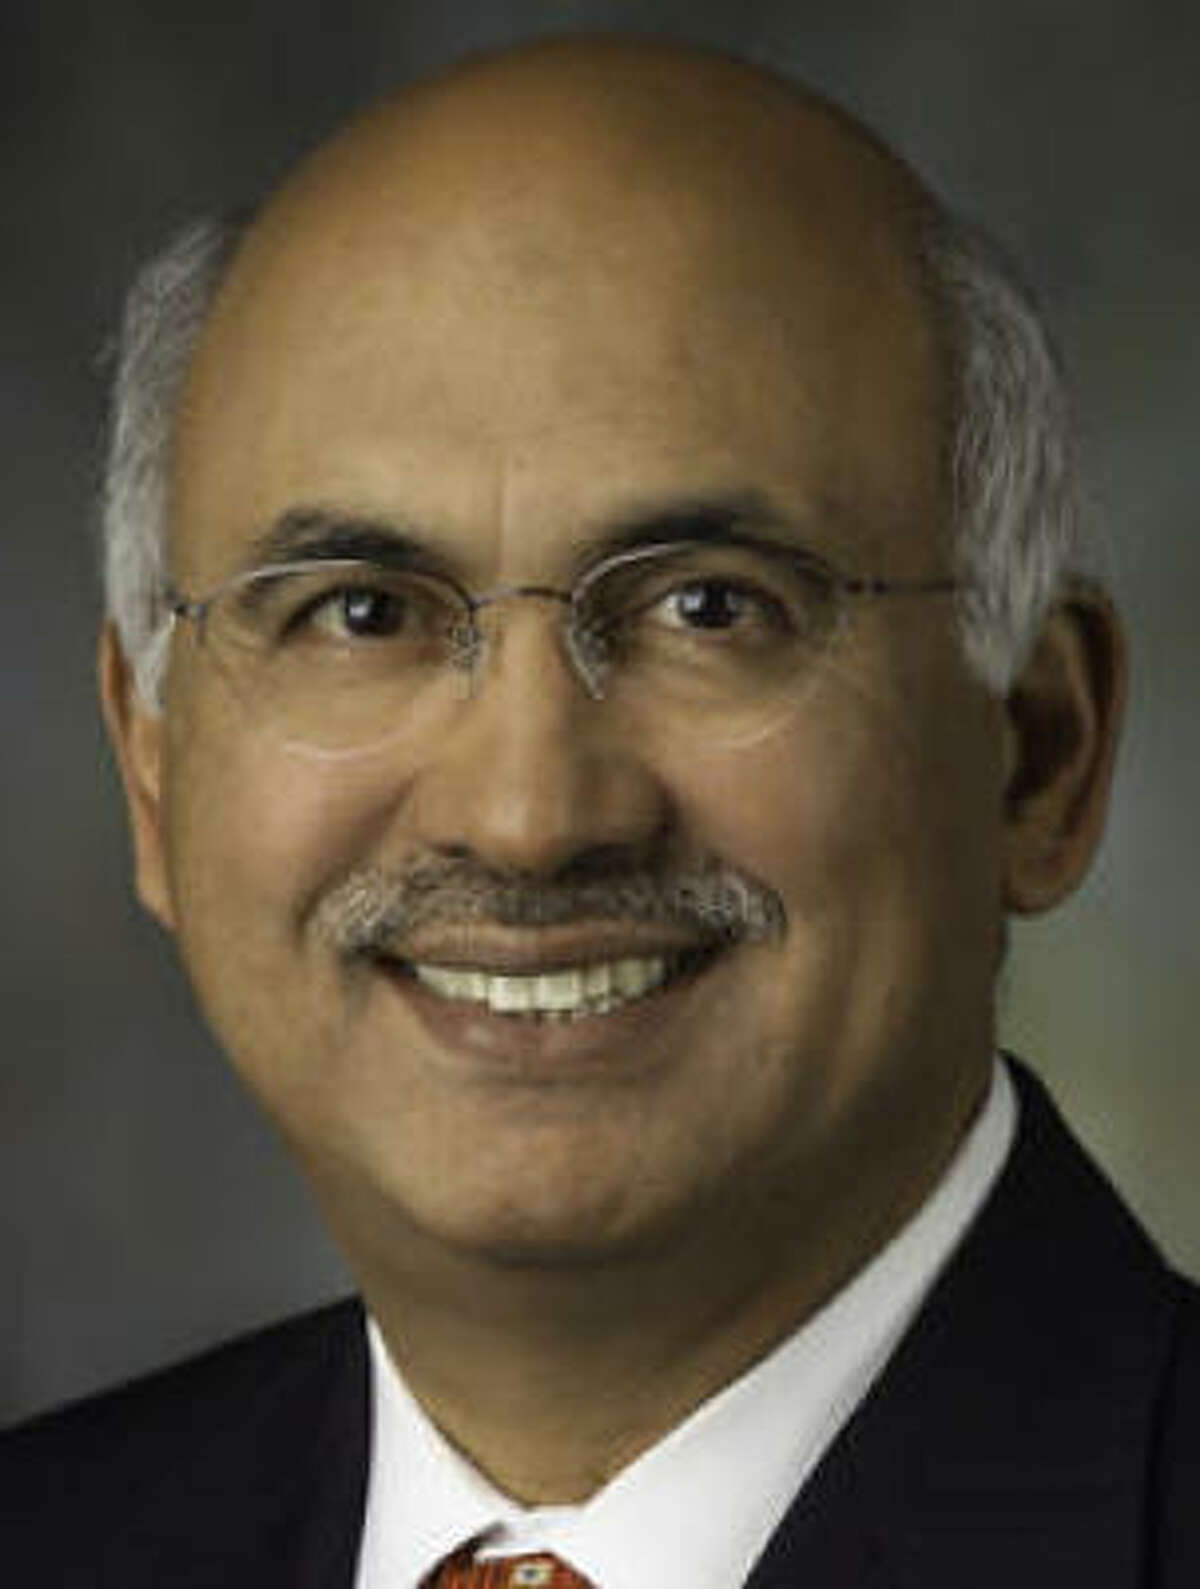 Candidate M.J. Khan touts his work on city finances as a council member.